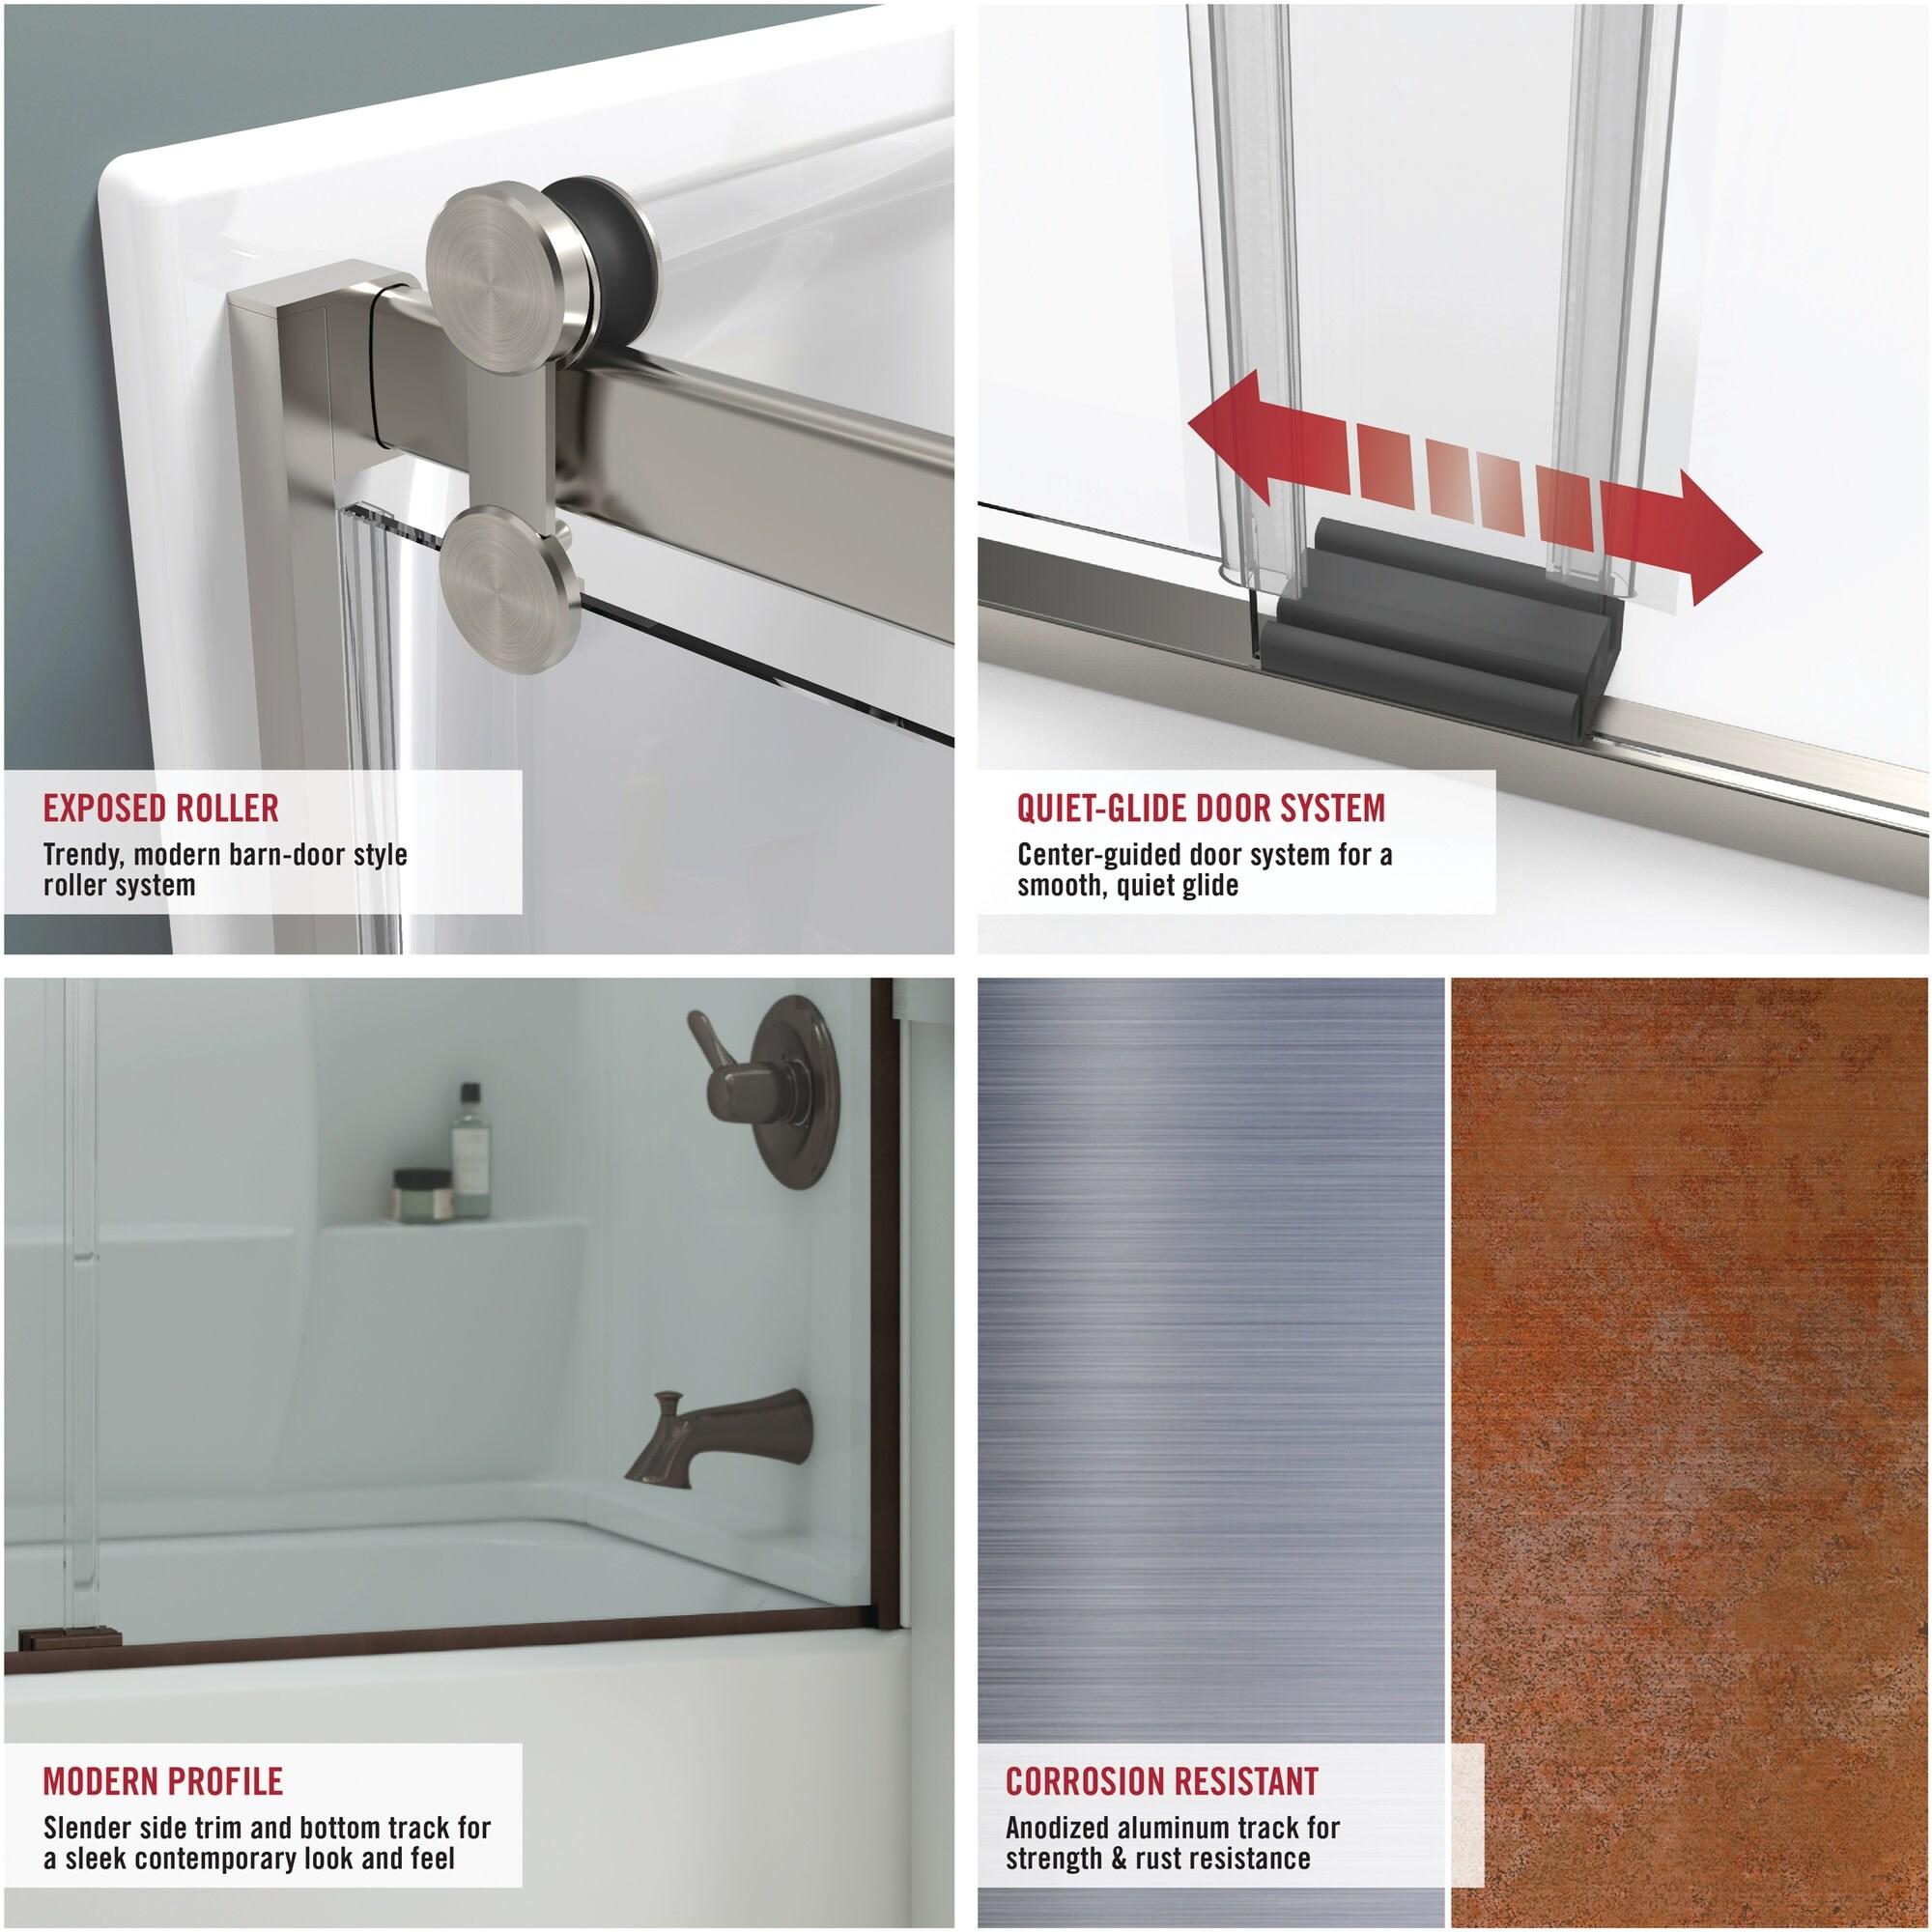 Chrome Niebla Glass 60 X 58 3 4 Delta Shower Doors Sd3927432 Classic Semi Frameless Contemporary Sliding Bathtub Tools Home Improvement Shower Doors